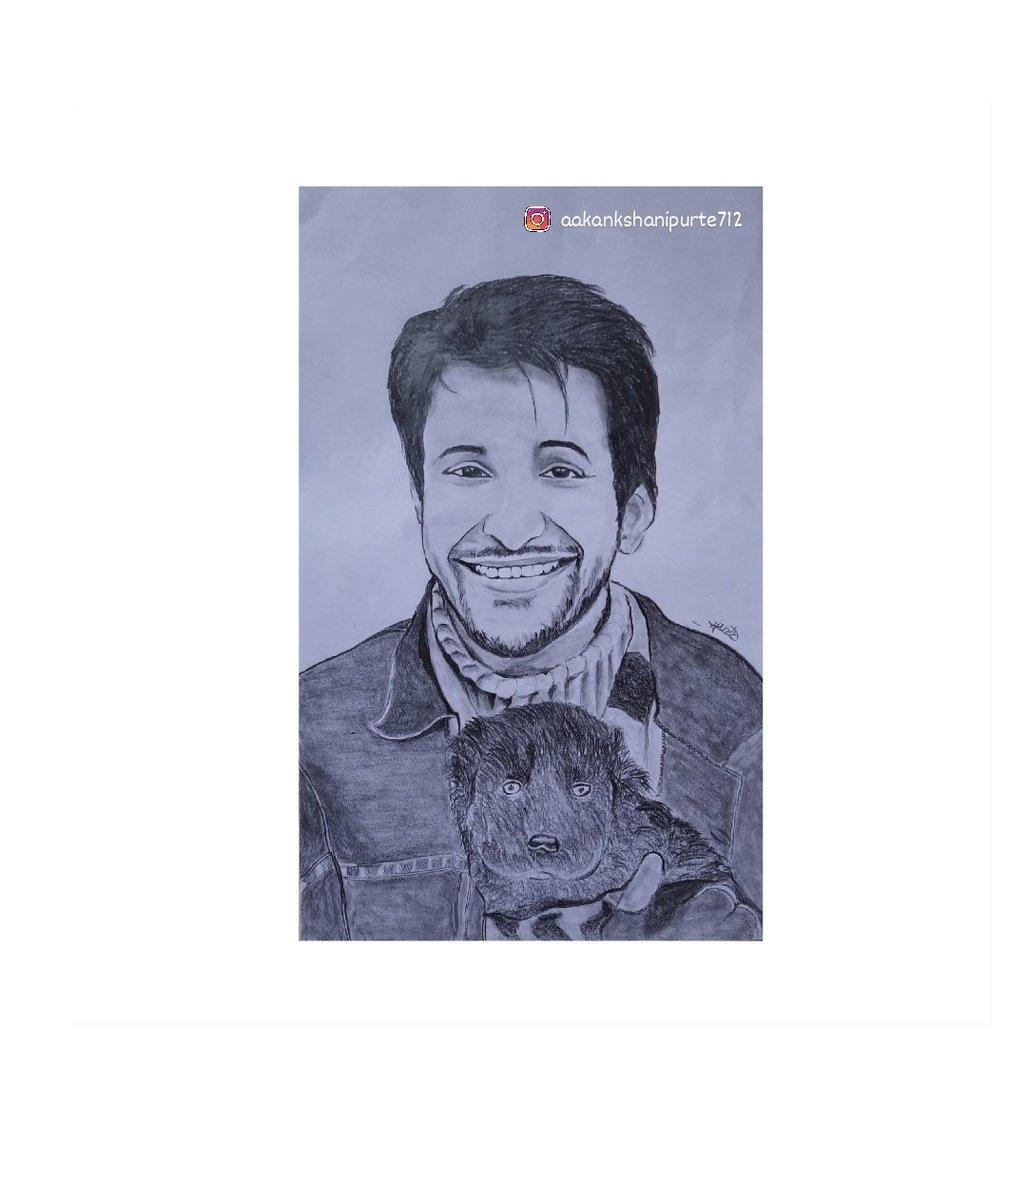 Do mention handsome @rohitsaraf10 in comment.  Follow me on Instagram @aakankshanipurte712 #aakankshanipurte712  Please like ,comment ,share .... In fram: @rohitsaraf10  #crush #cuterohitsaraf  #rohitsaraf #rohitsarafedits  #art #instadaily #artist  #pencilart #pencildrawing